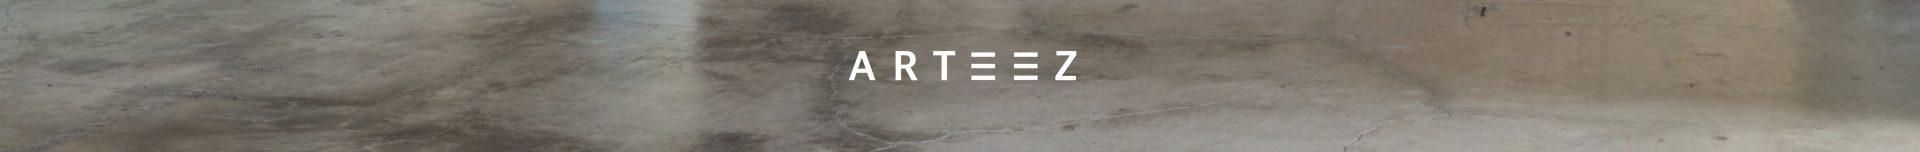 cropped-arteez_logo.jpg